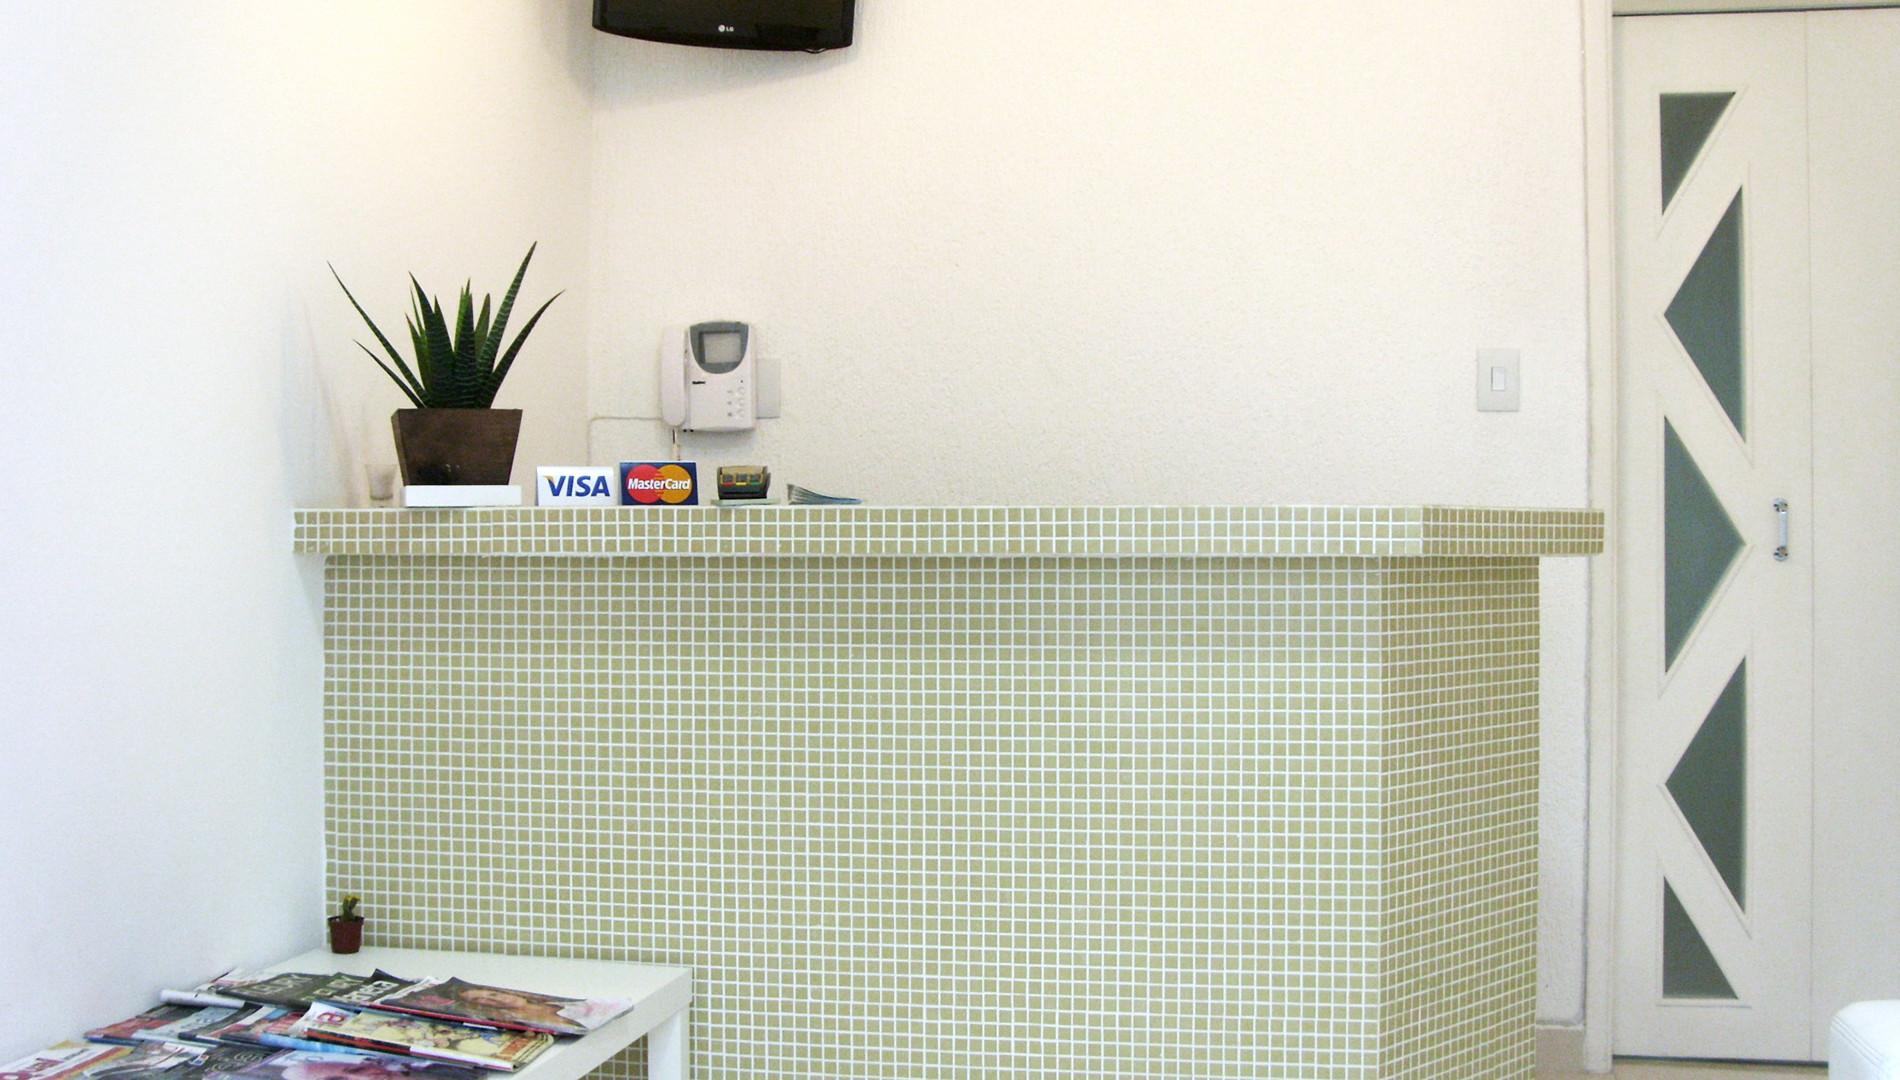 oral odontologia guarulhos, dentista em guarulhos, estética dental em guarulhos